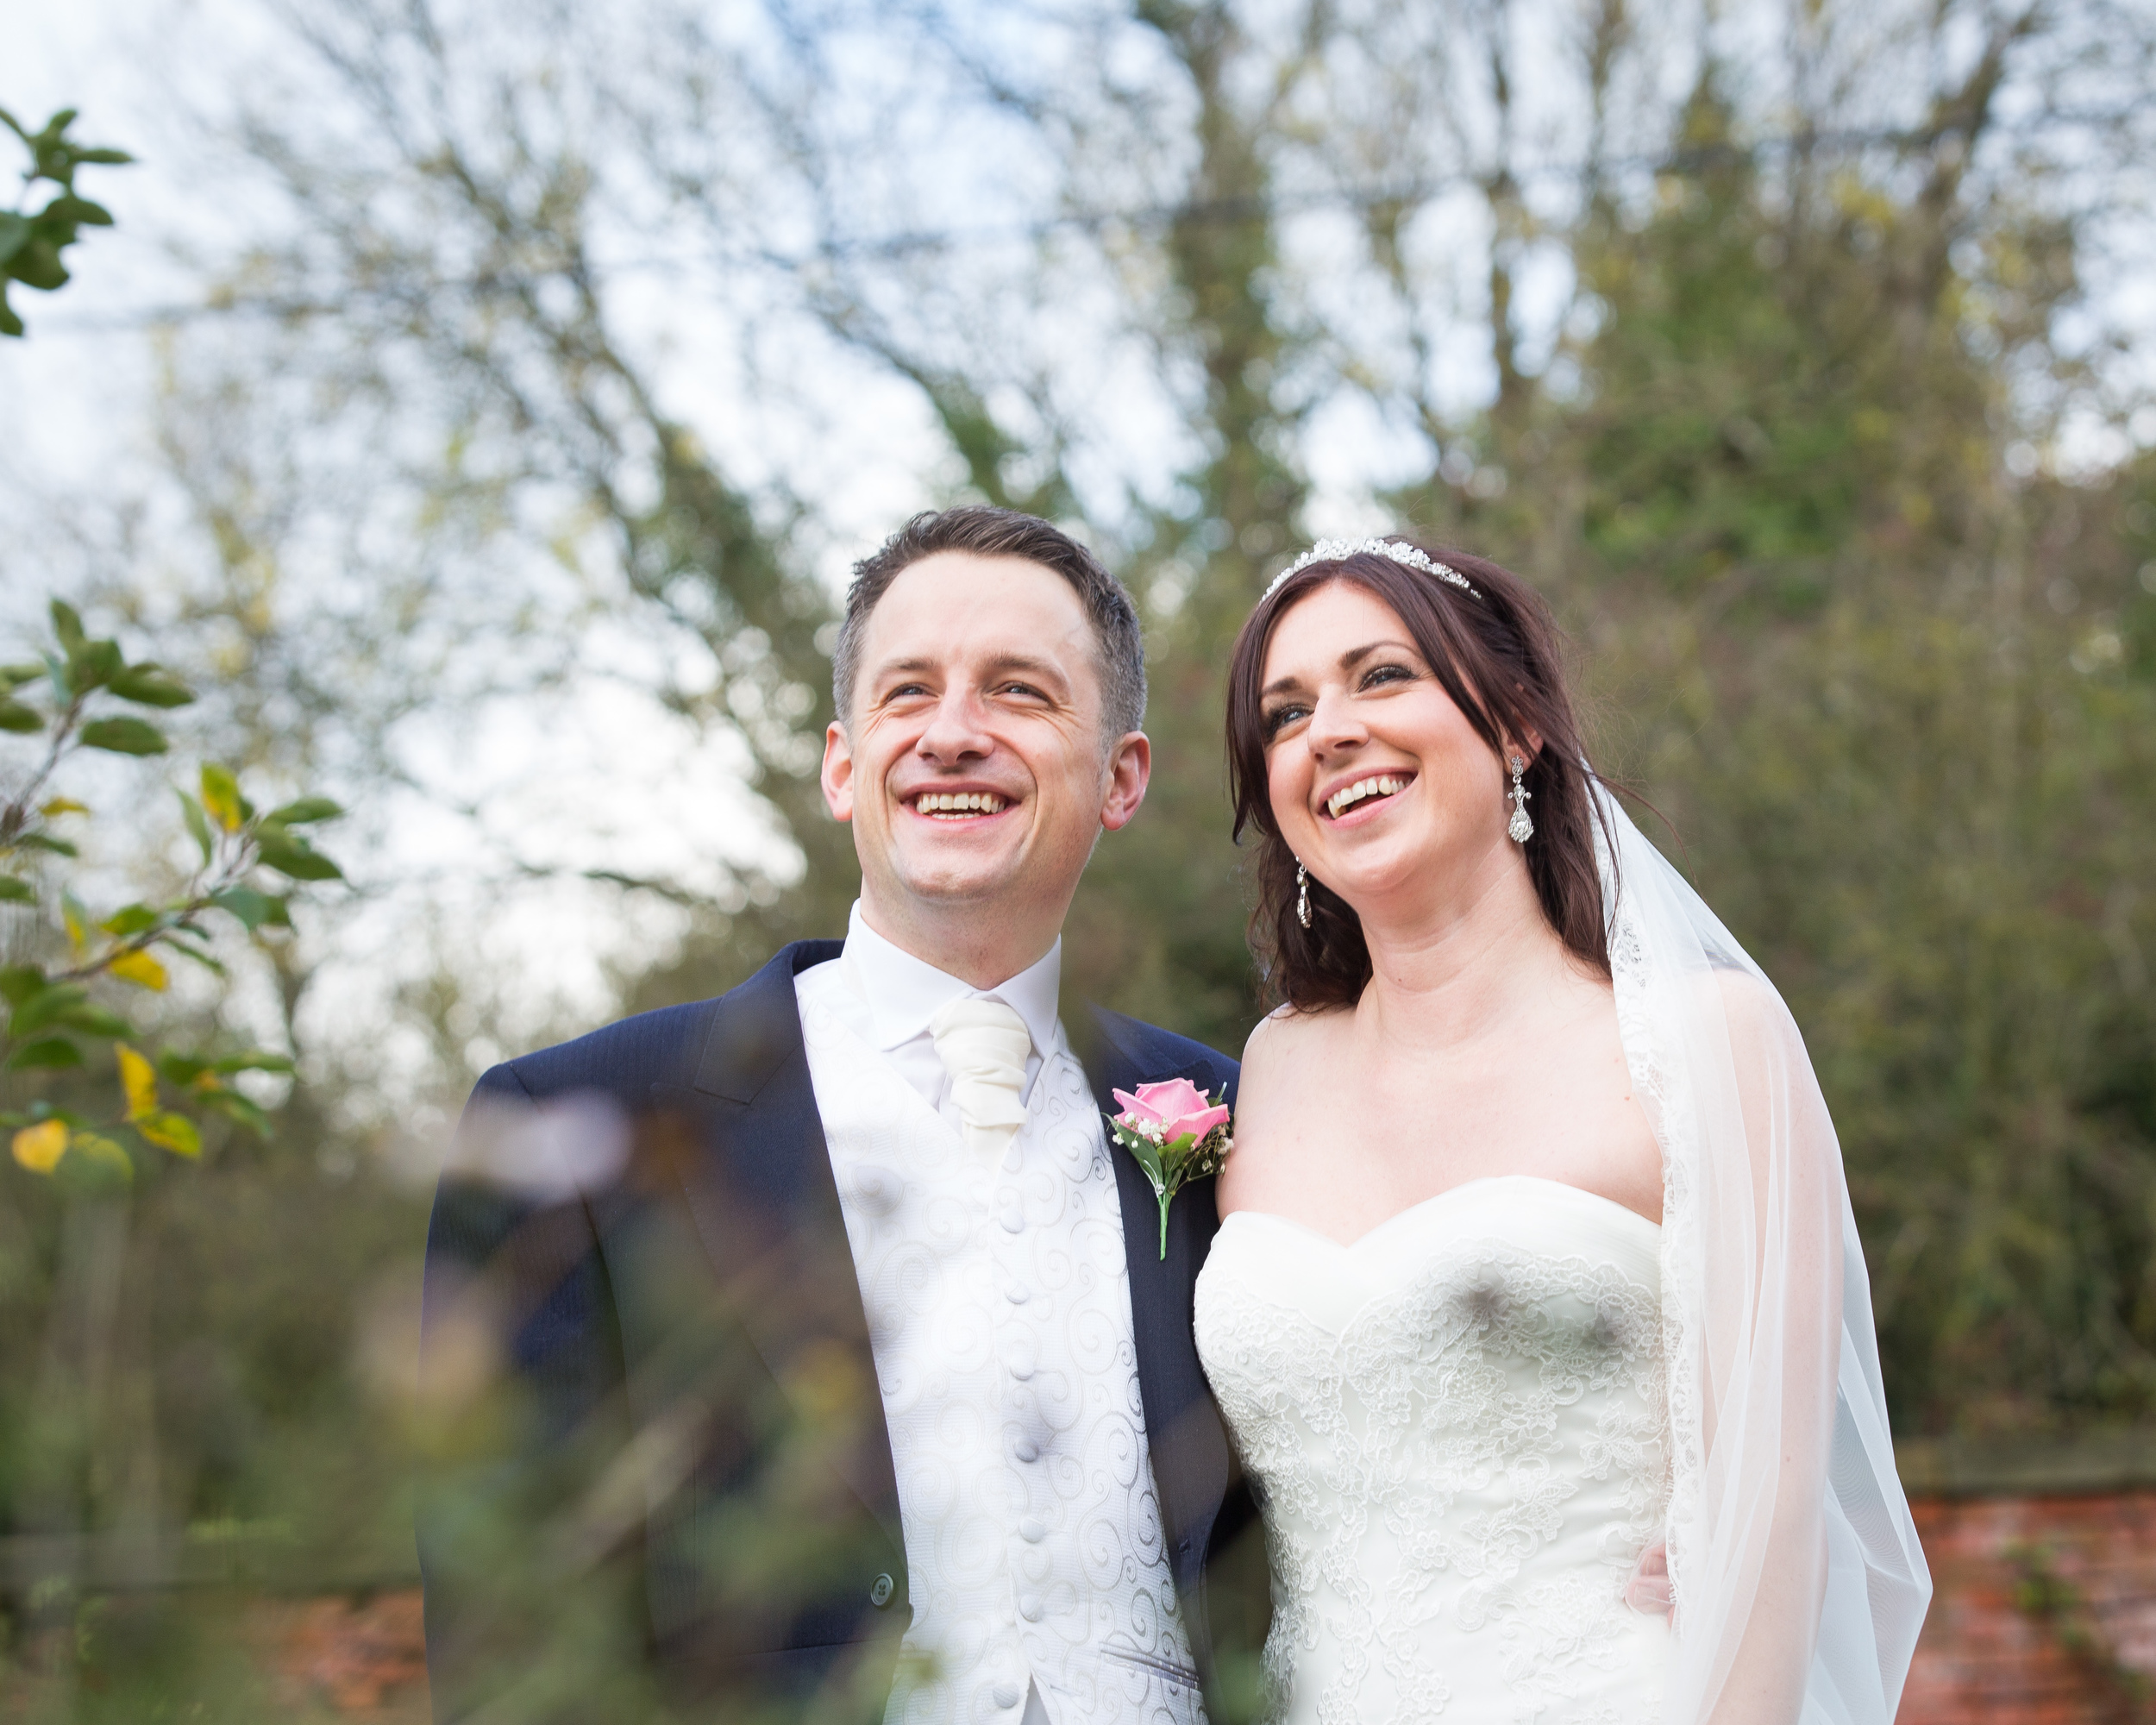 Mr-And-Mrs-Cunningham-207.jpg